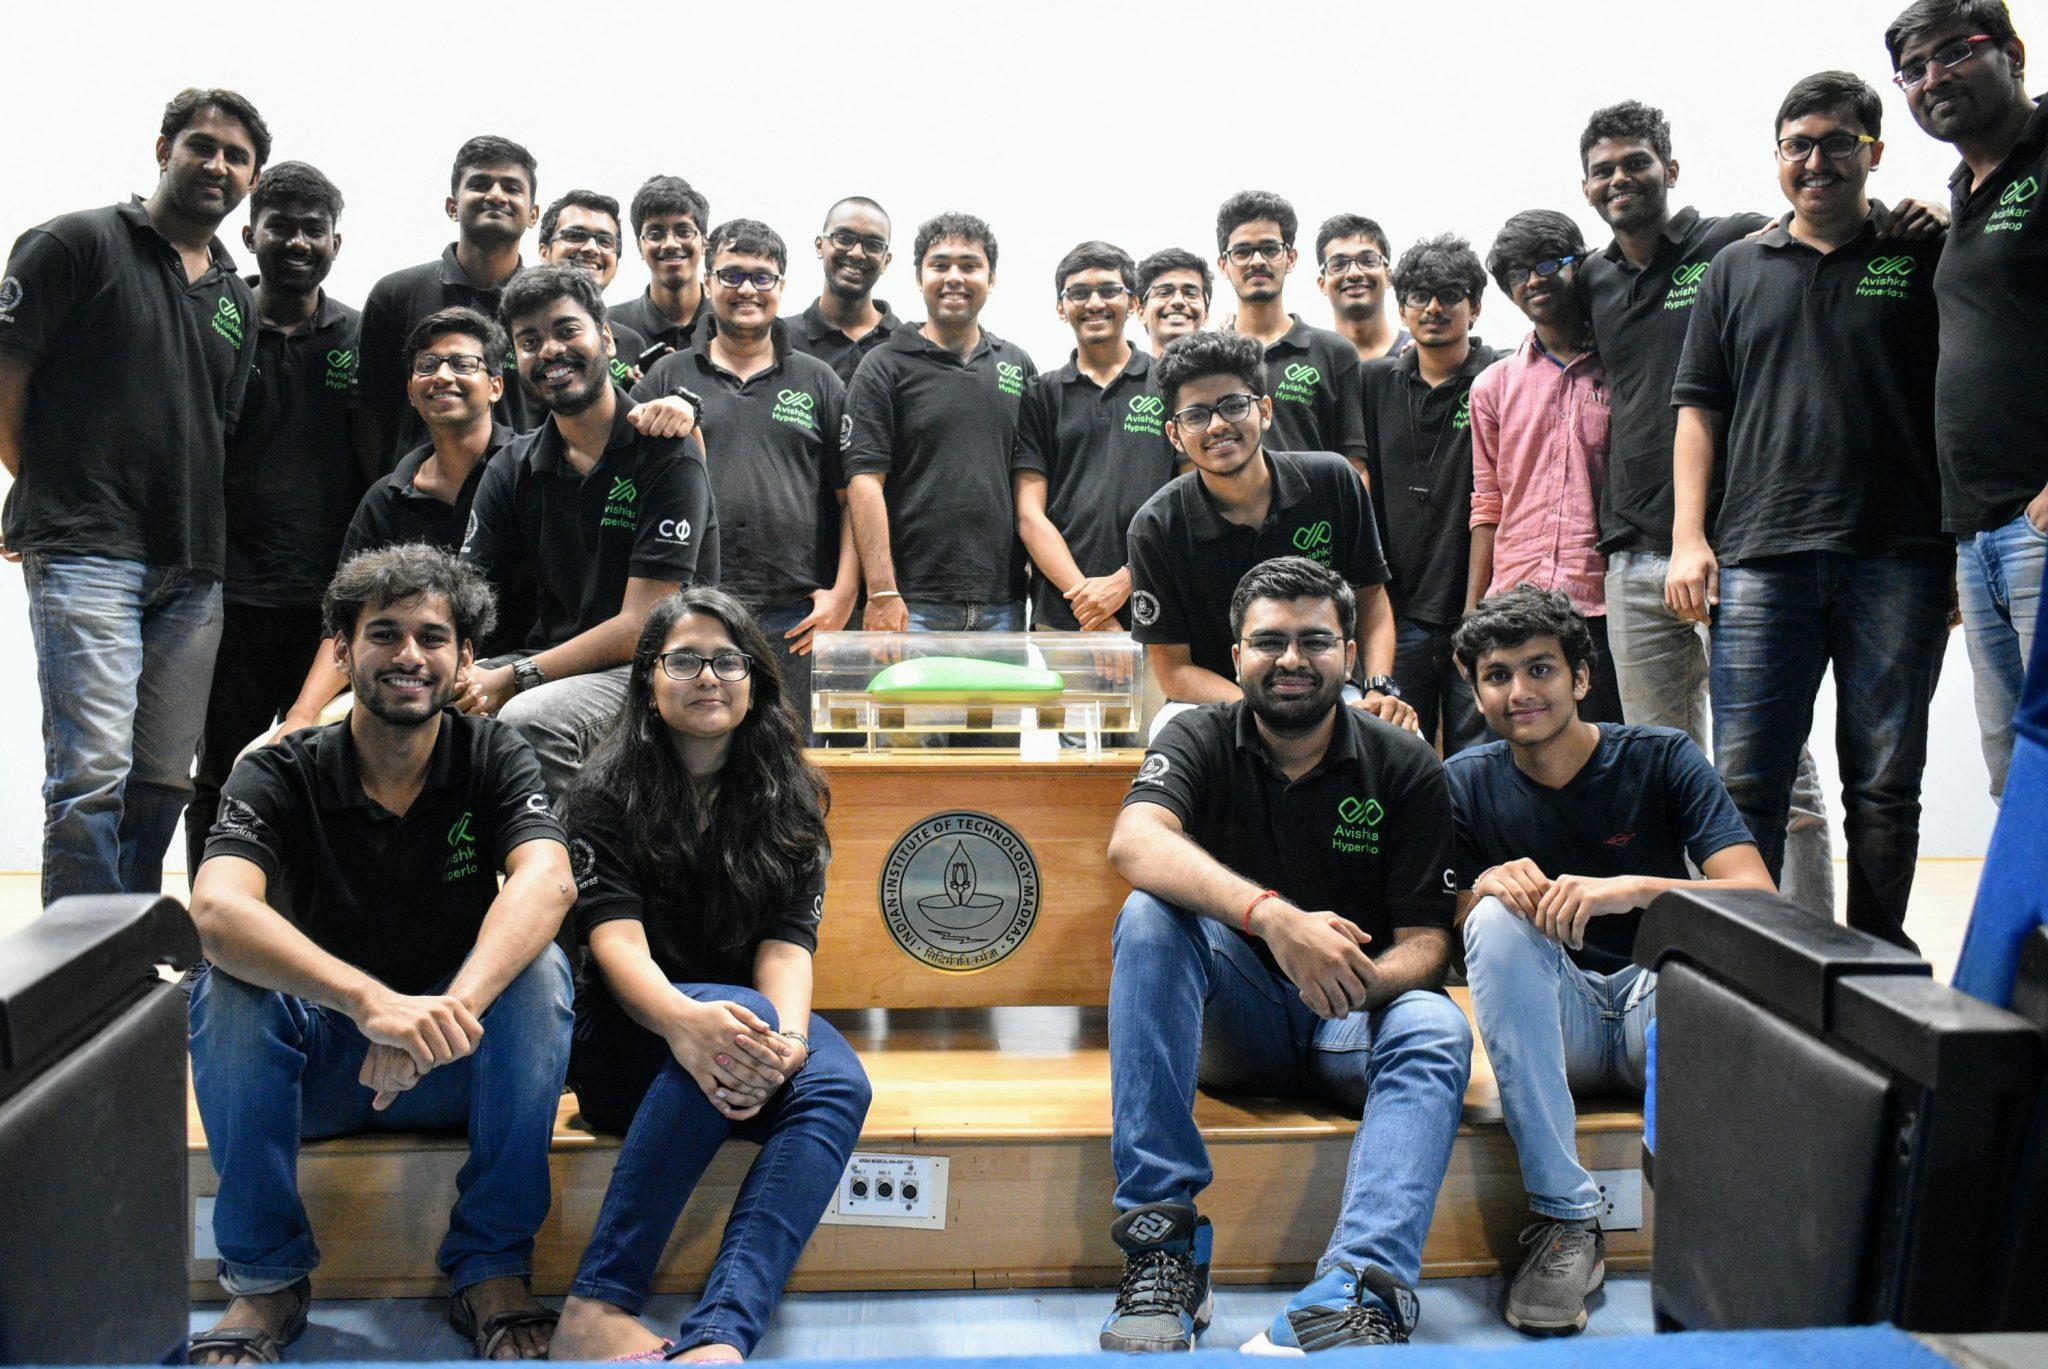 IIT-Madras' Team Avishkar Reaches The Final Round In SpaceX's Hyperloop Pod Competition